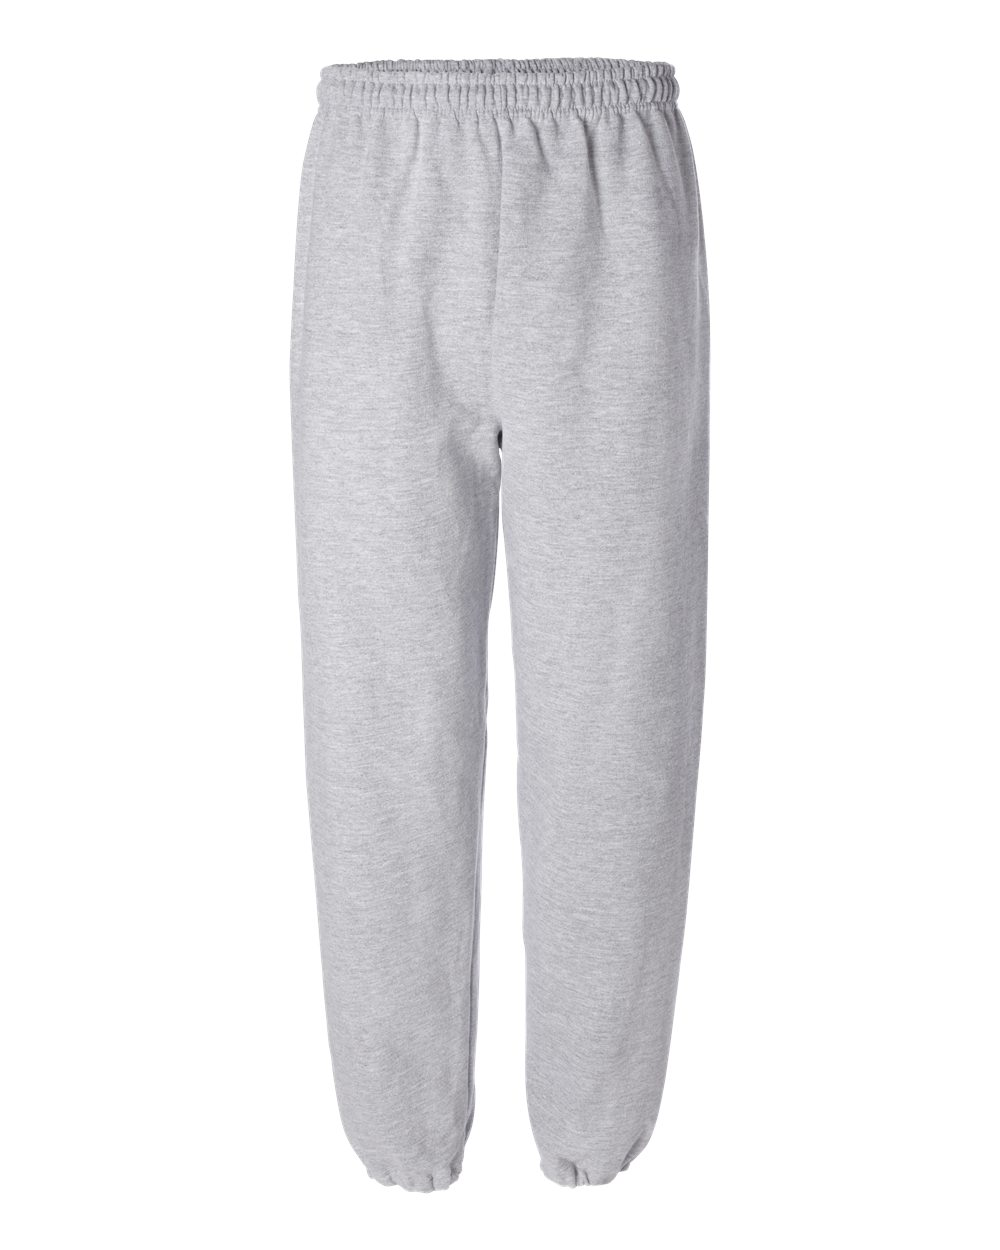 Gildan-Mens-Heavy-Blend-Sweatpants-18200-up-to-2XL thumbnail 15